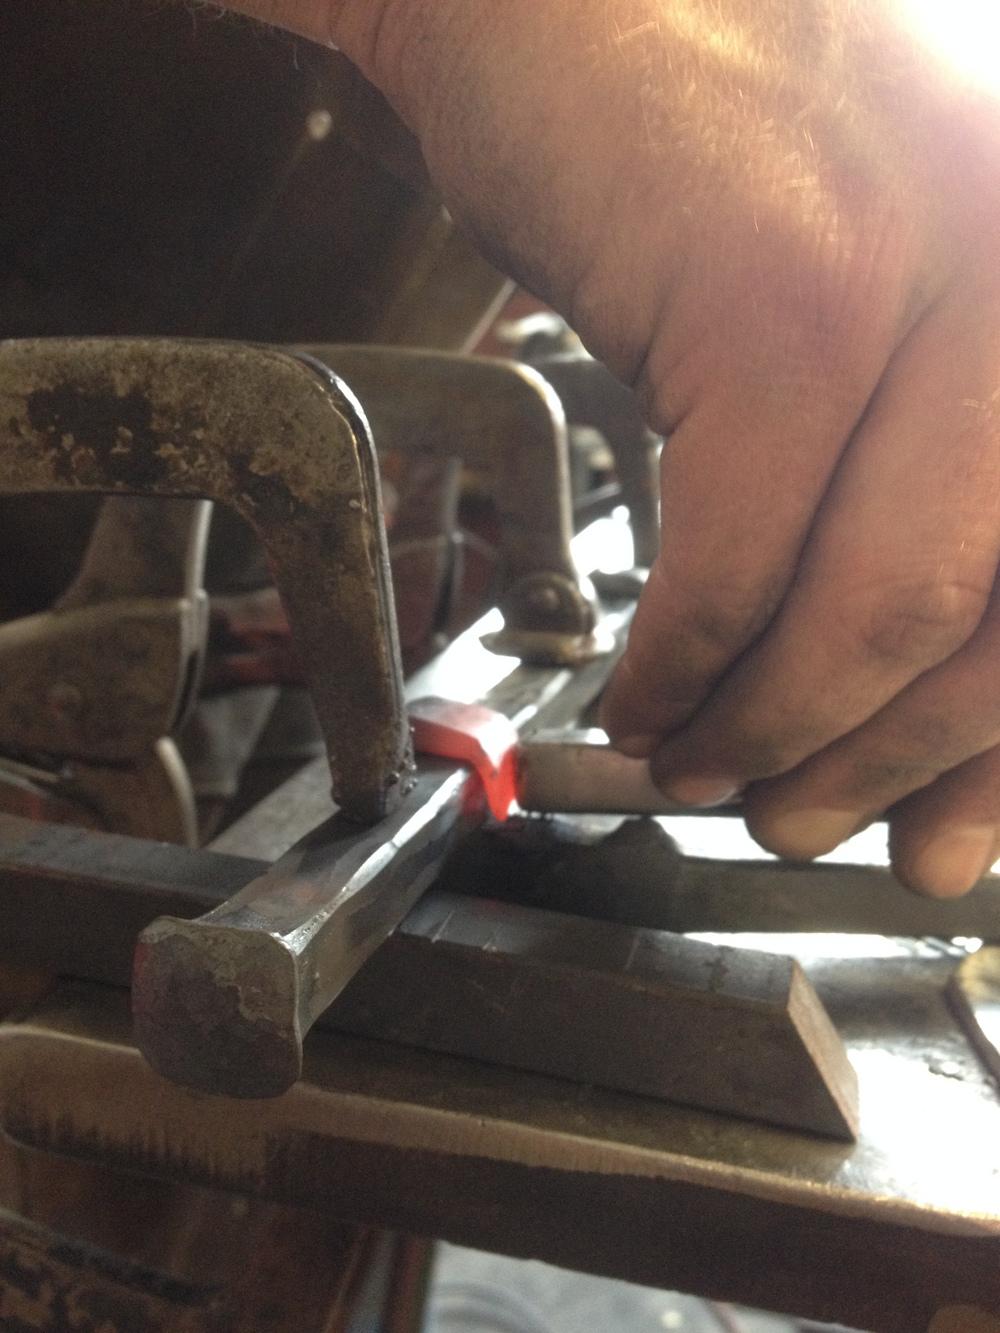 Forging fireplace tools